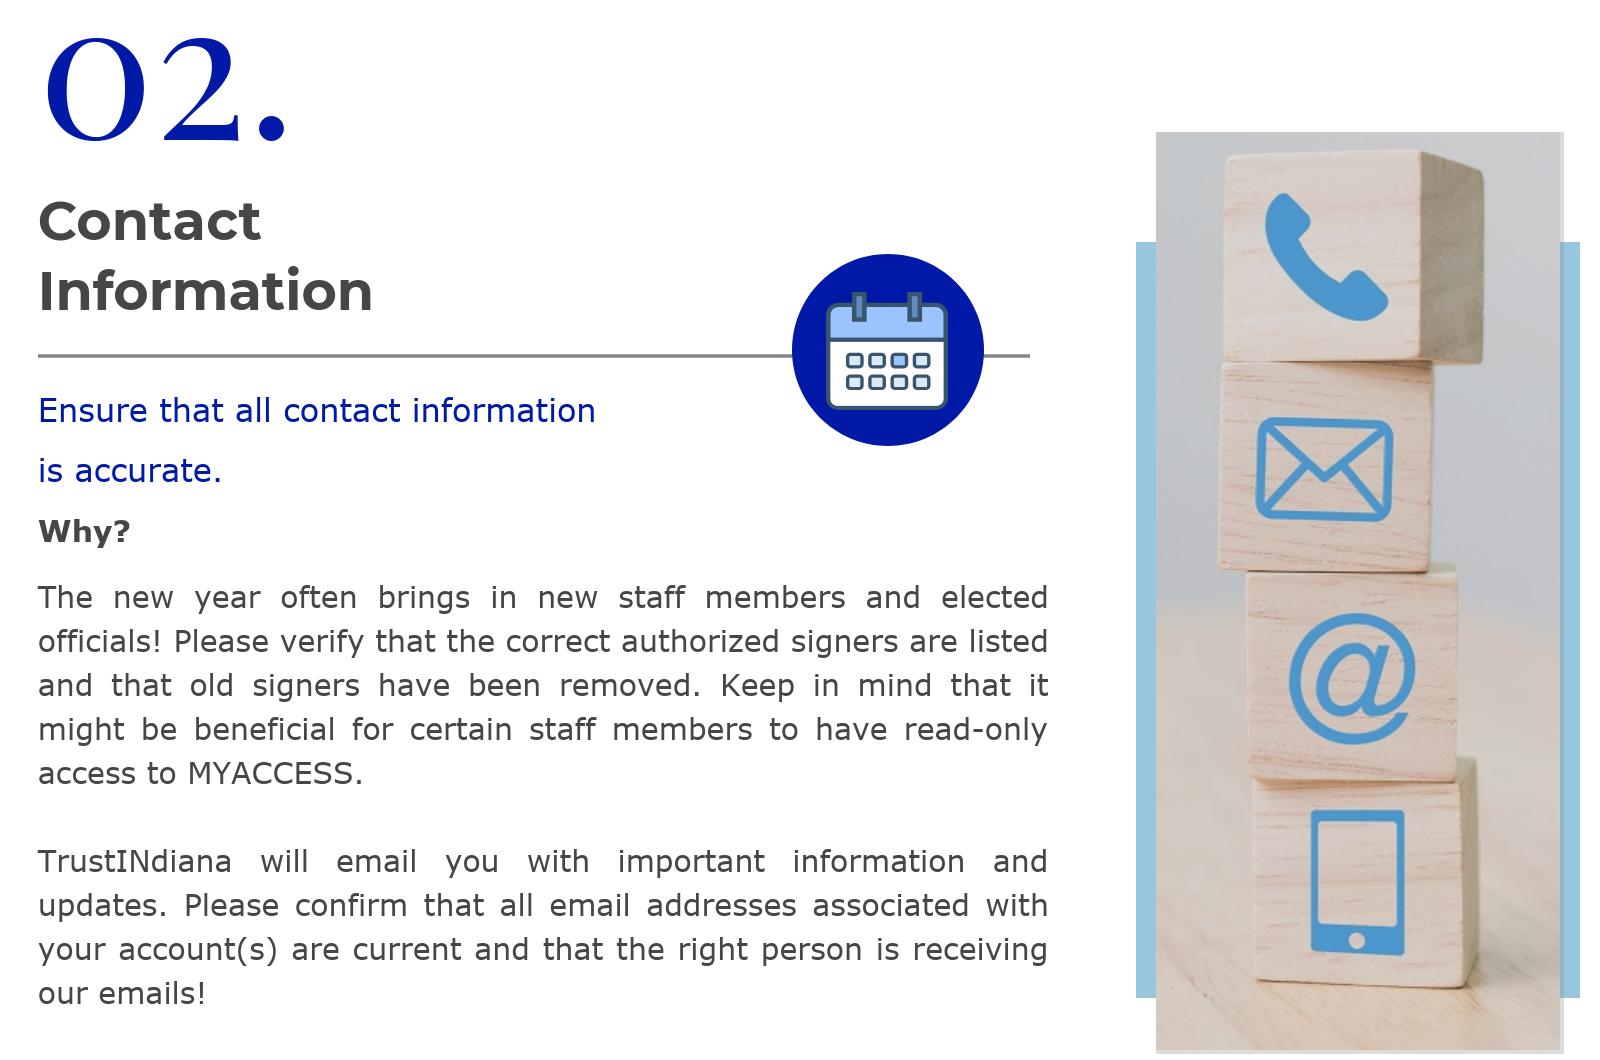 12.18 - TrustINdiana Investor Contact Information